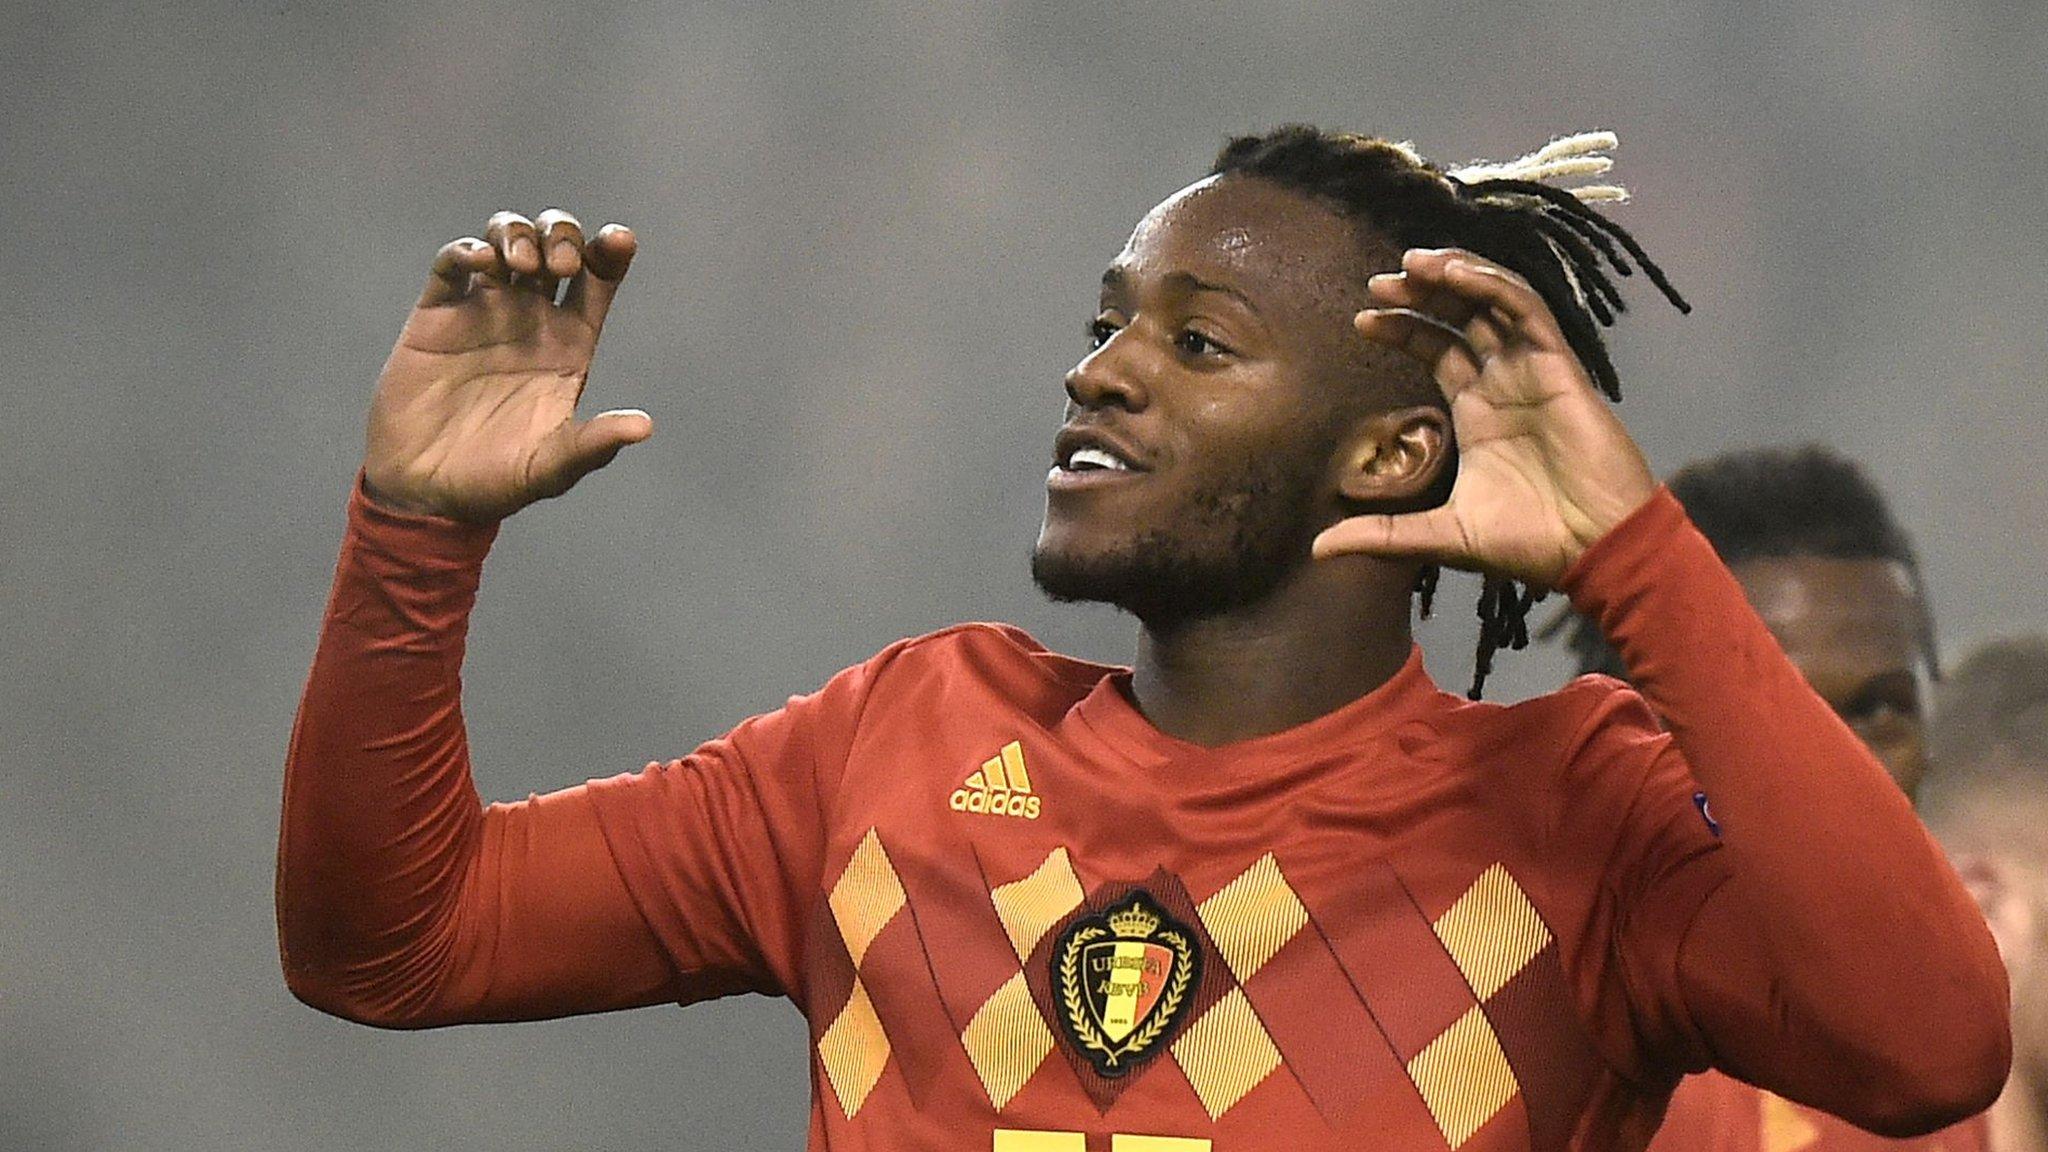 Belgium 2-0 Iceland: Michy Batshuayi scores twice in comfortable win